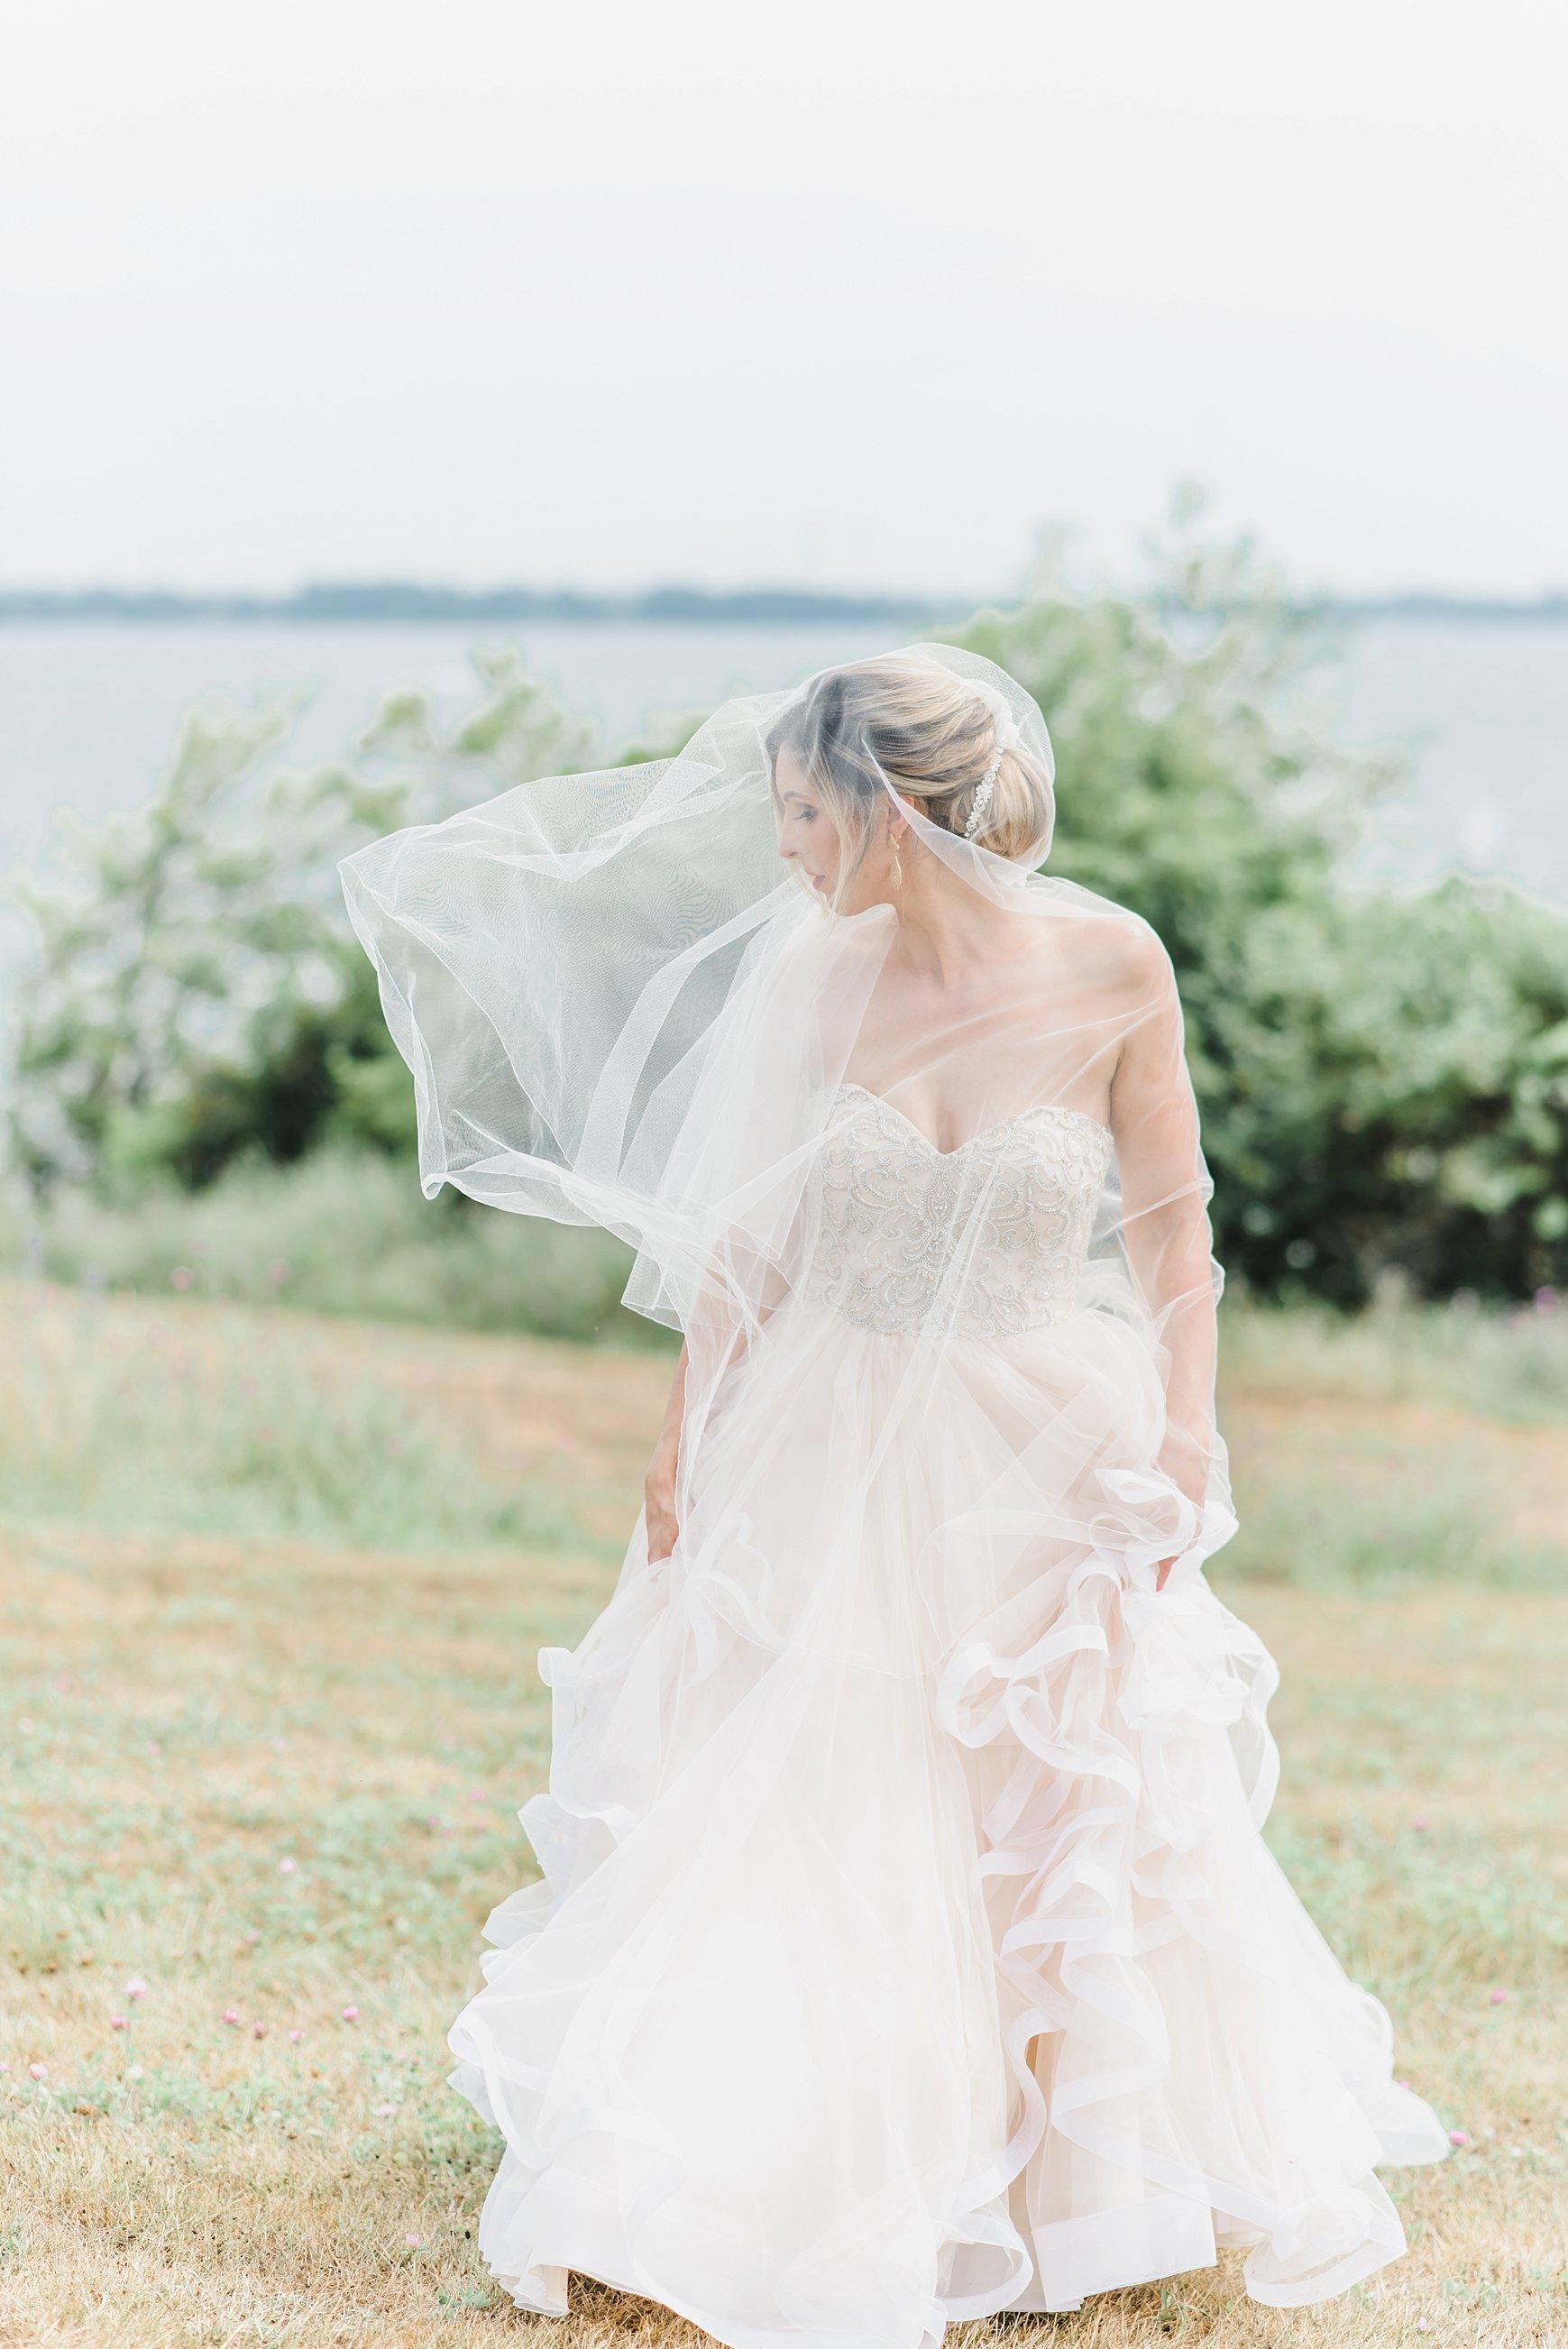 light airy indie fine art ottawa wedding photographer | Ali and Batoul Photography_0171.jpg